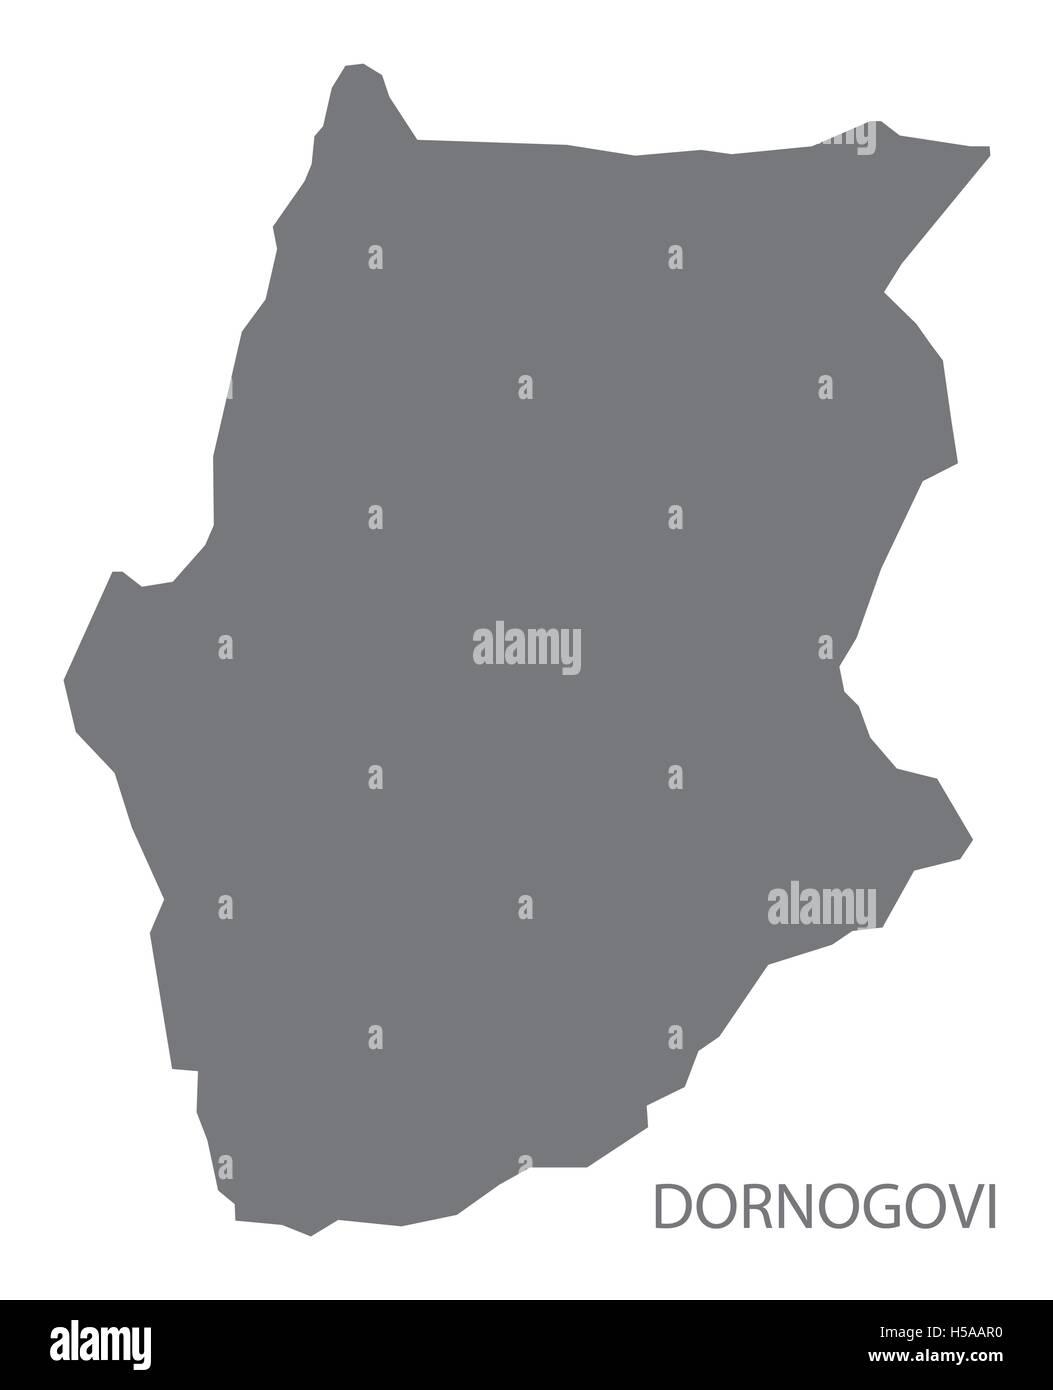 Dornogovi Mongolia Map grey - Stock Vector